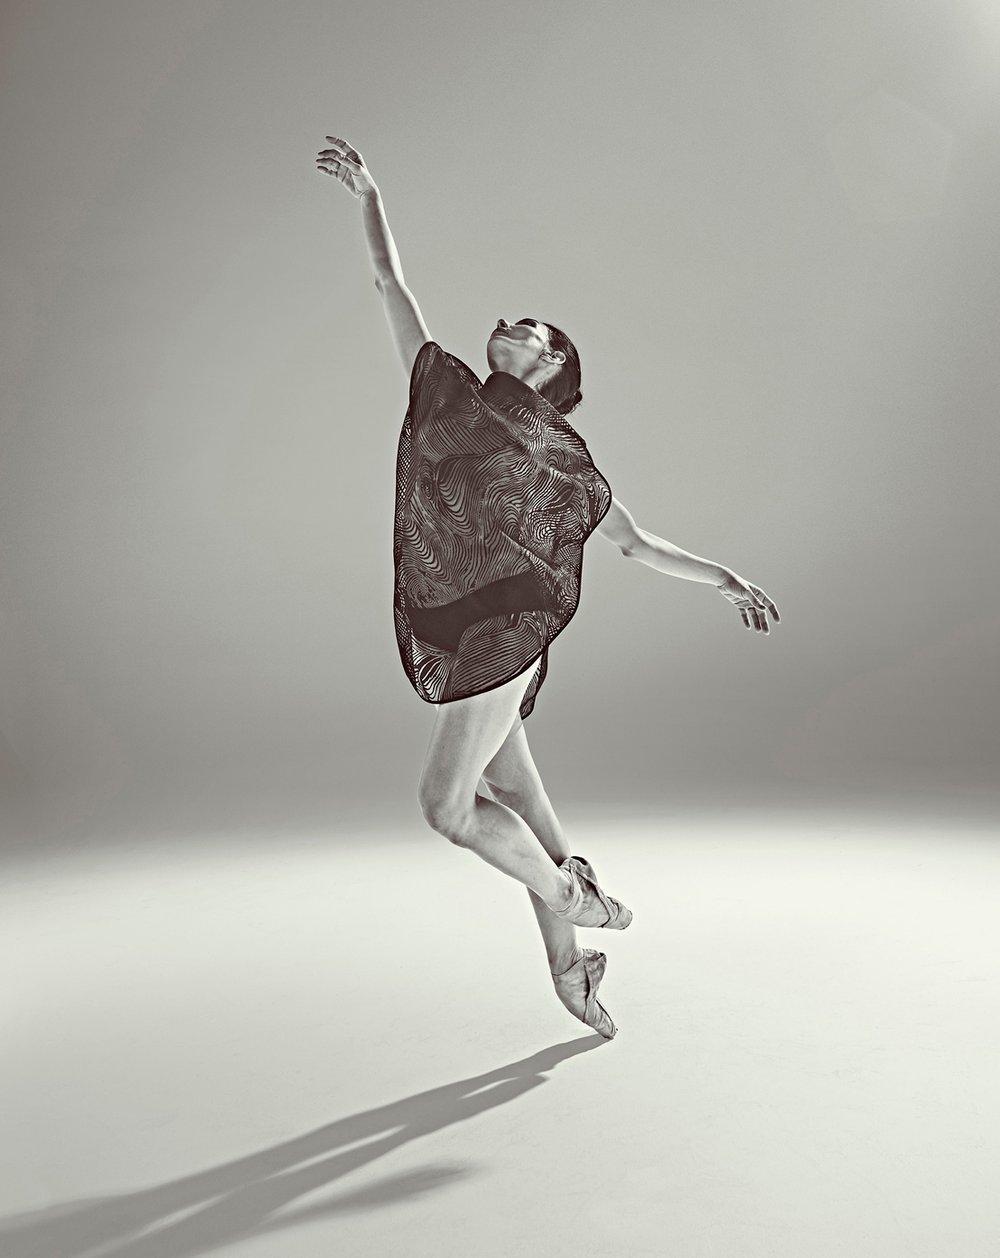 Image of Tamara Rojo - Artistic Director and Lead Dancer at English National Ballet